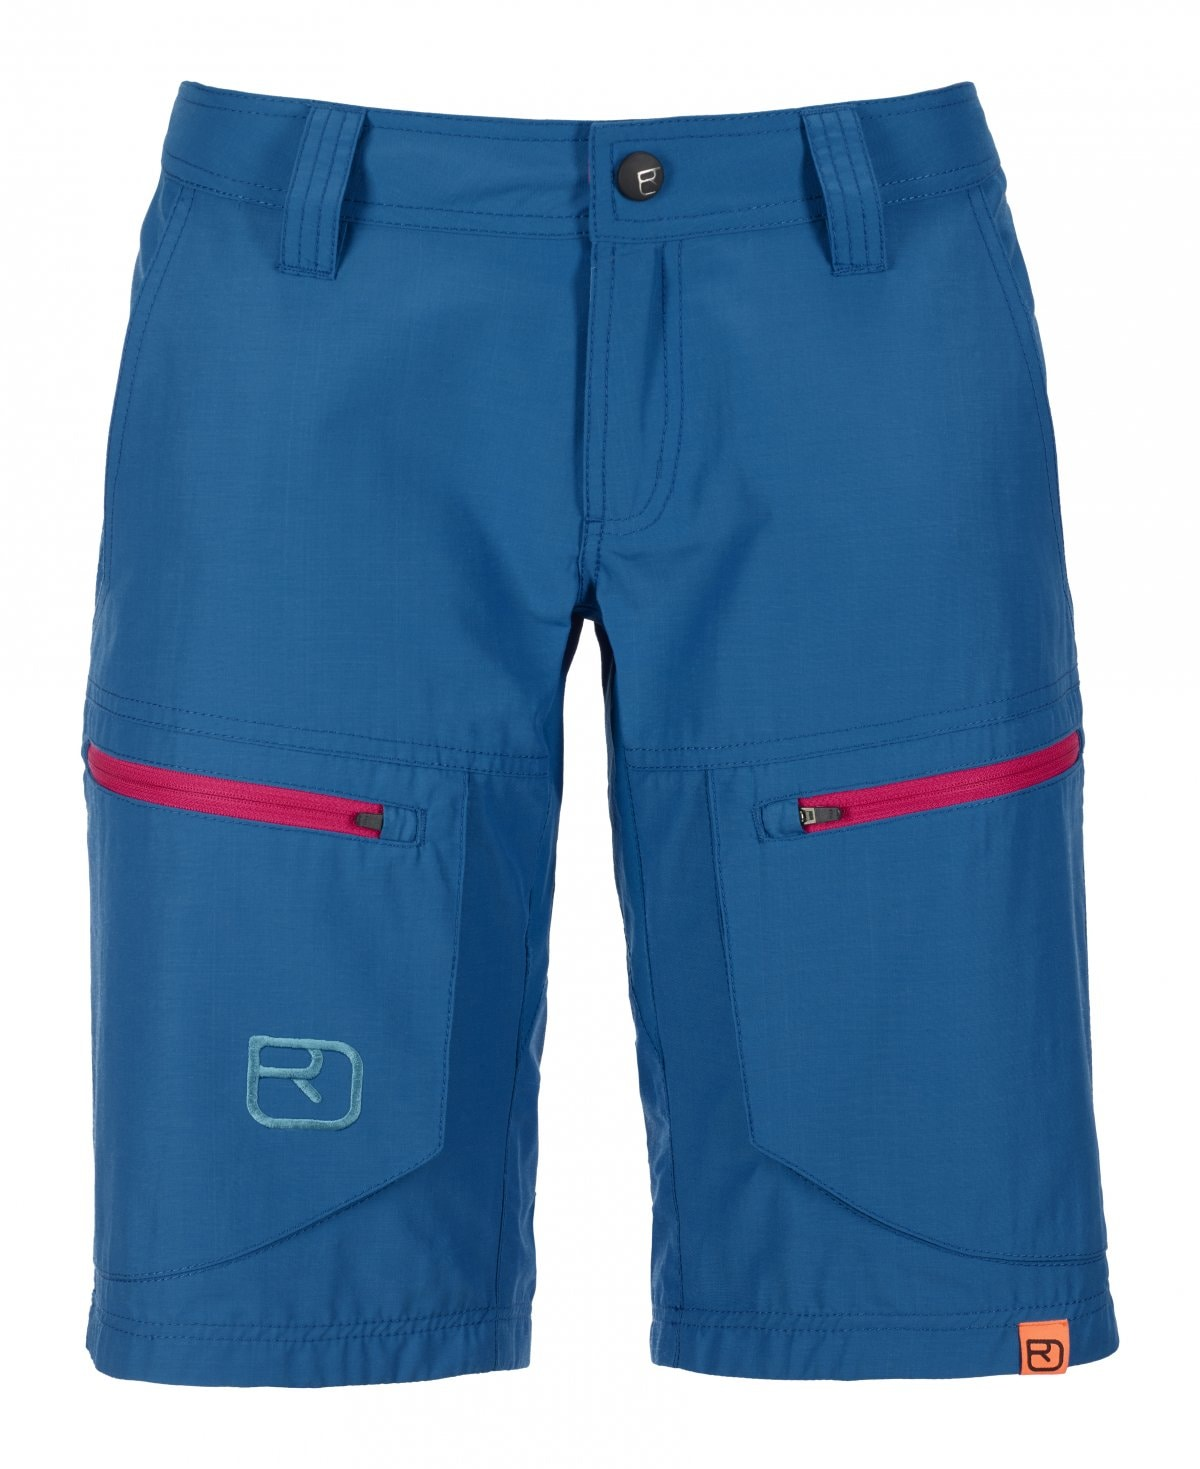 Ortovox Shorts Vintage Cargo, W's